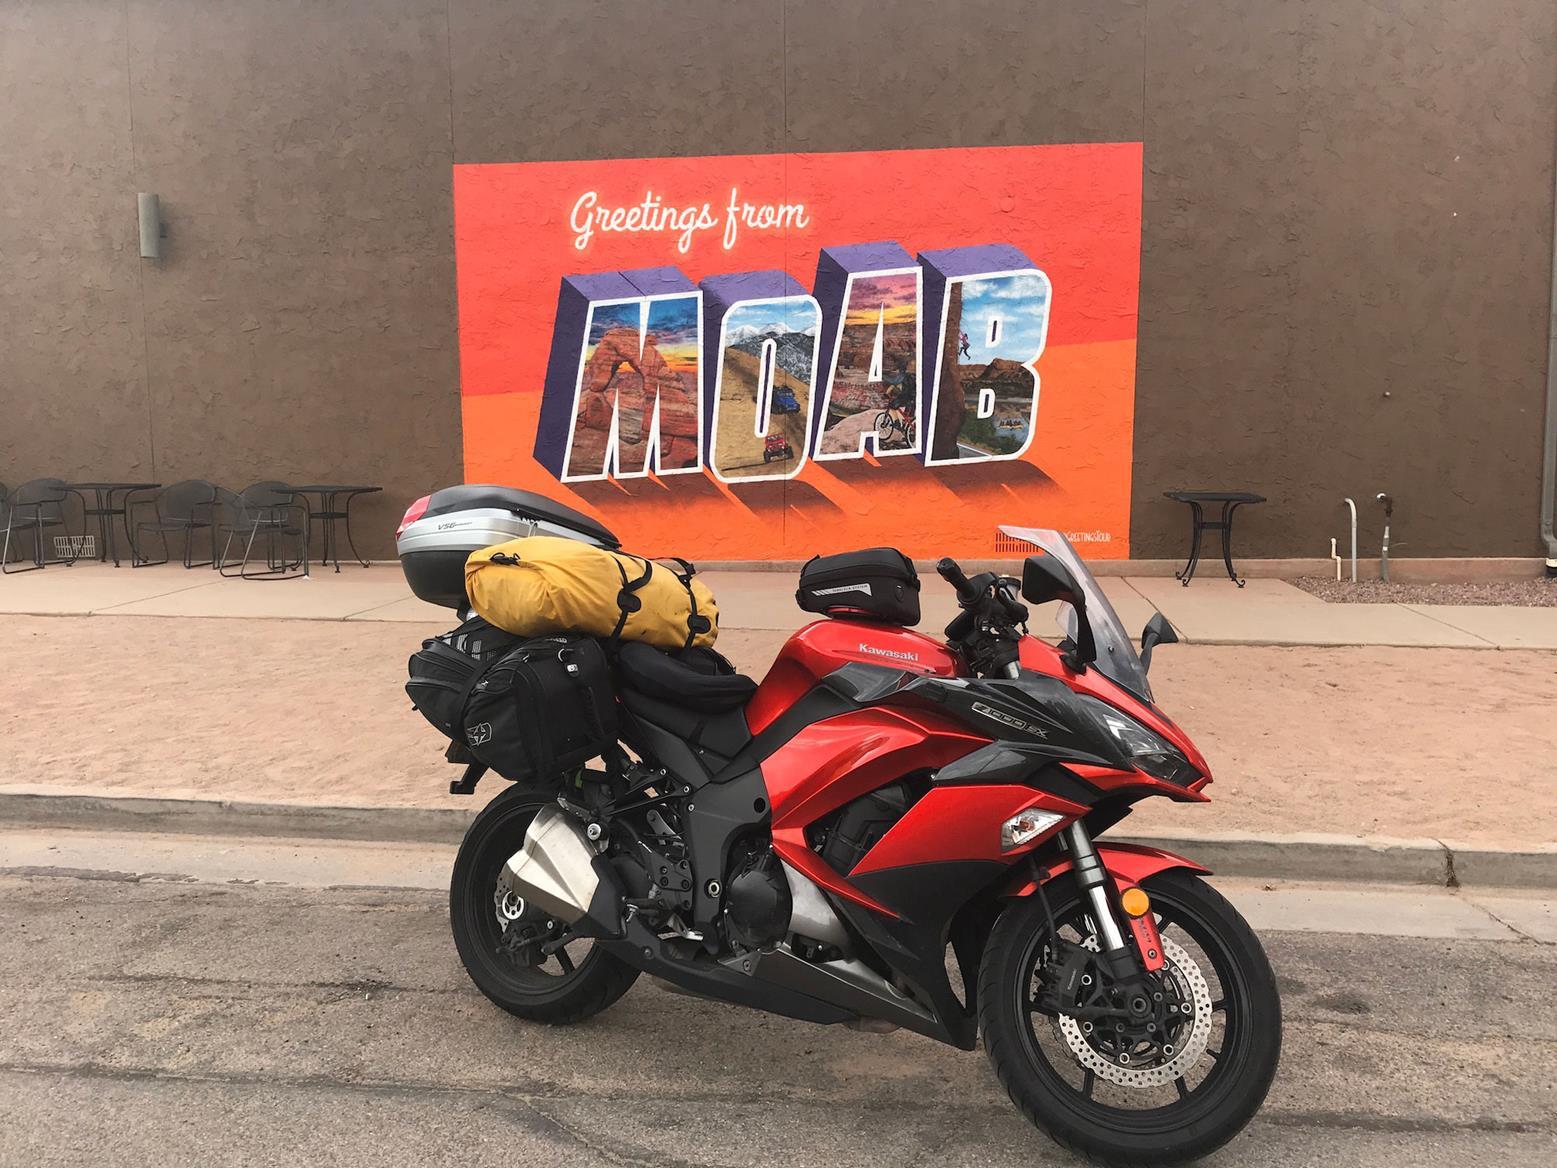 Simon's Kawasaki Z1000SX in Moab